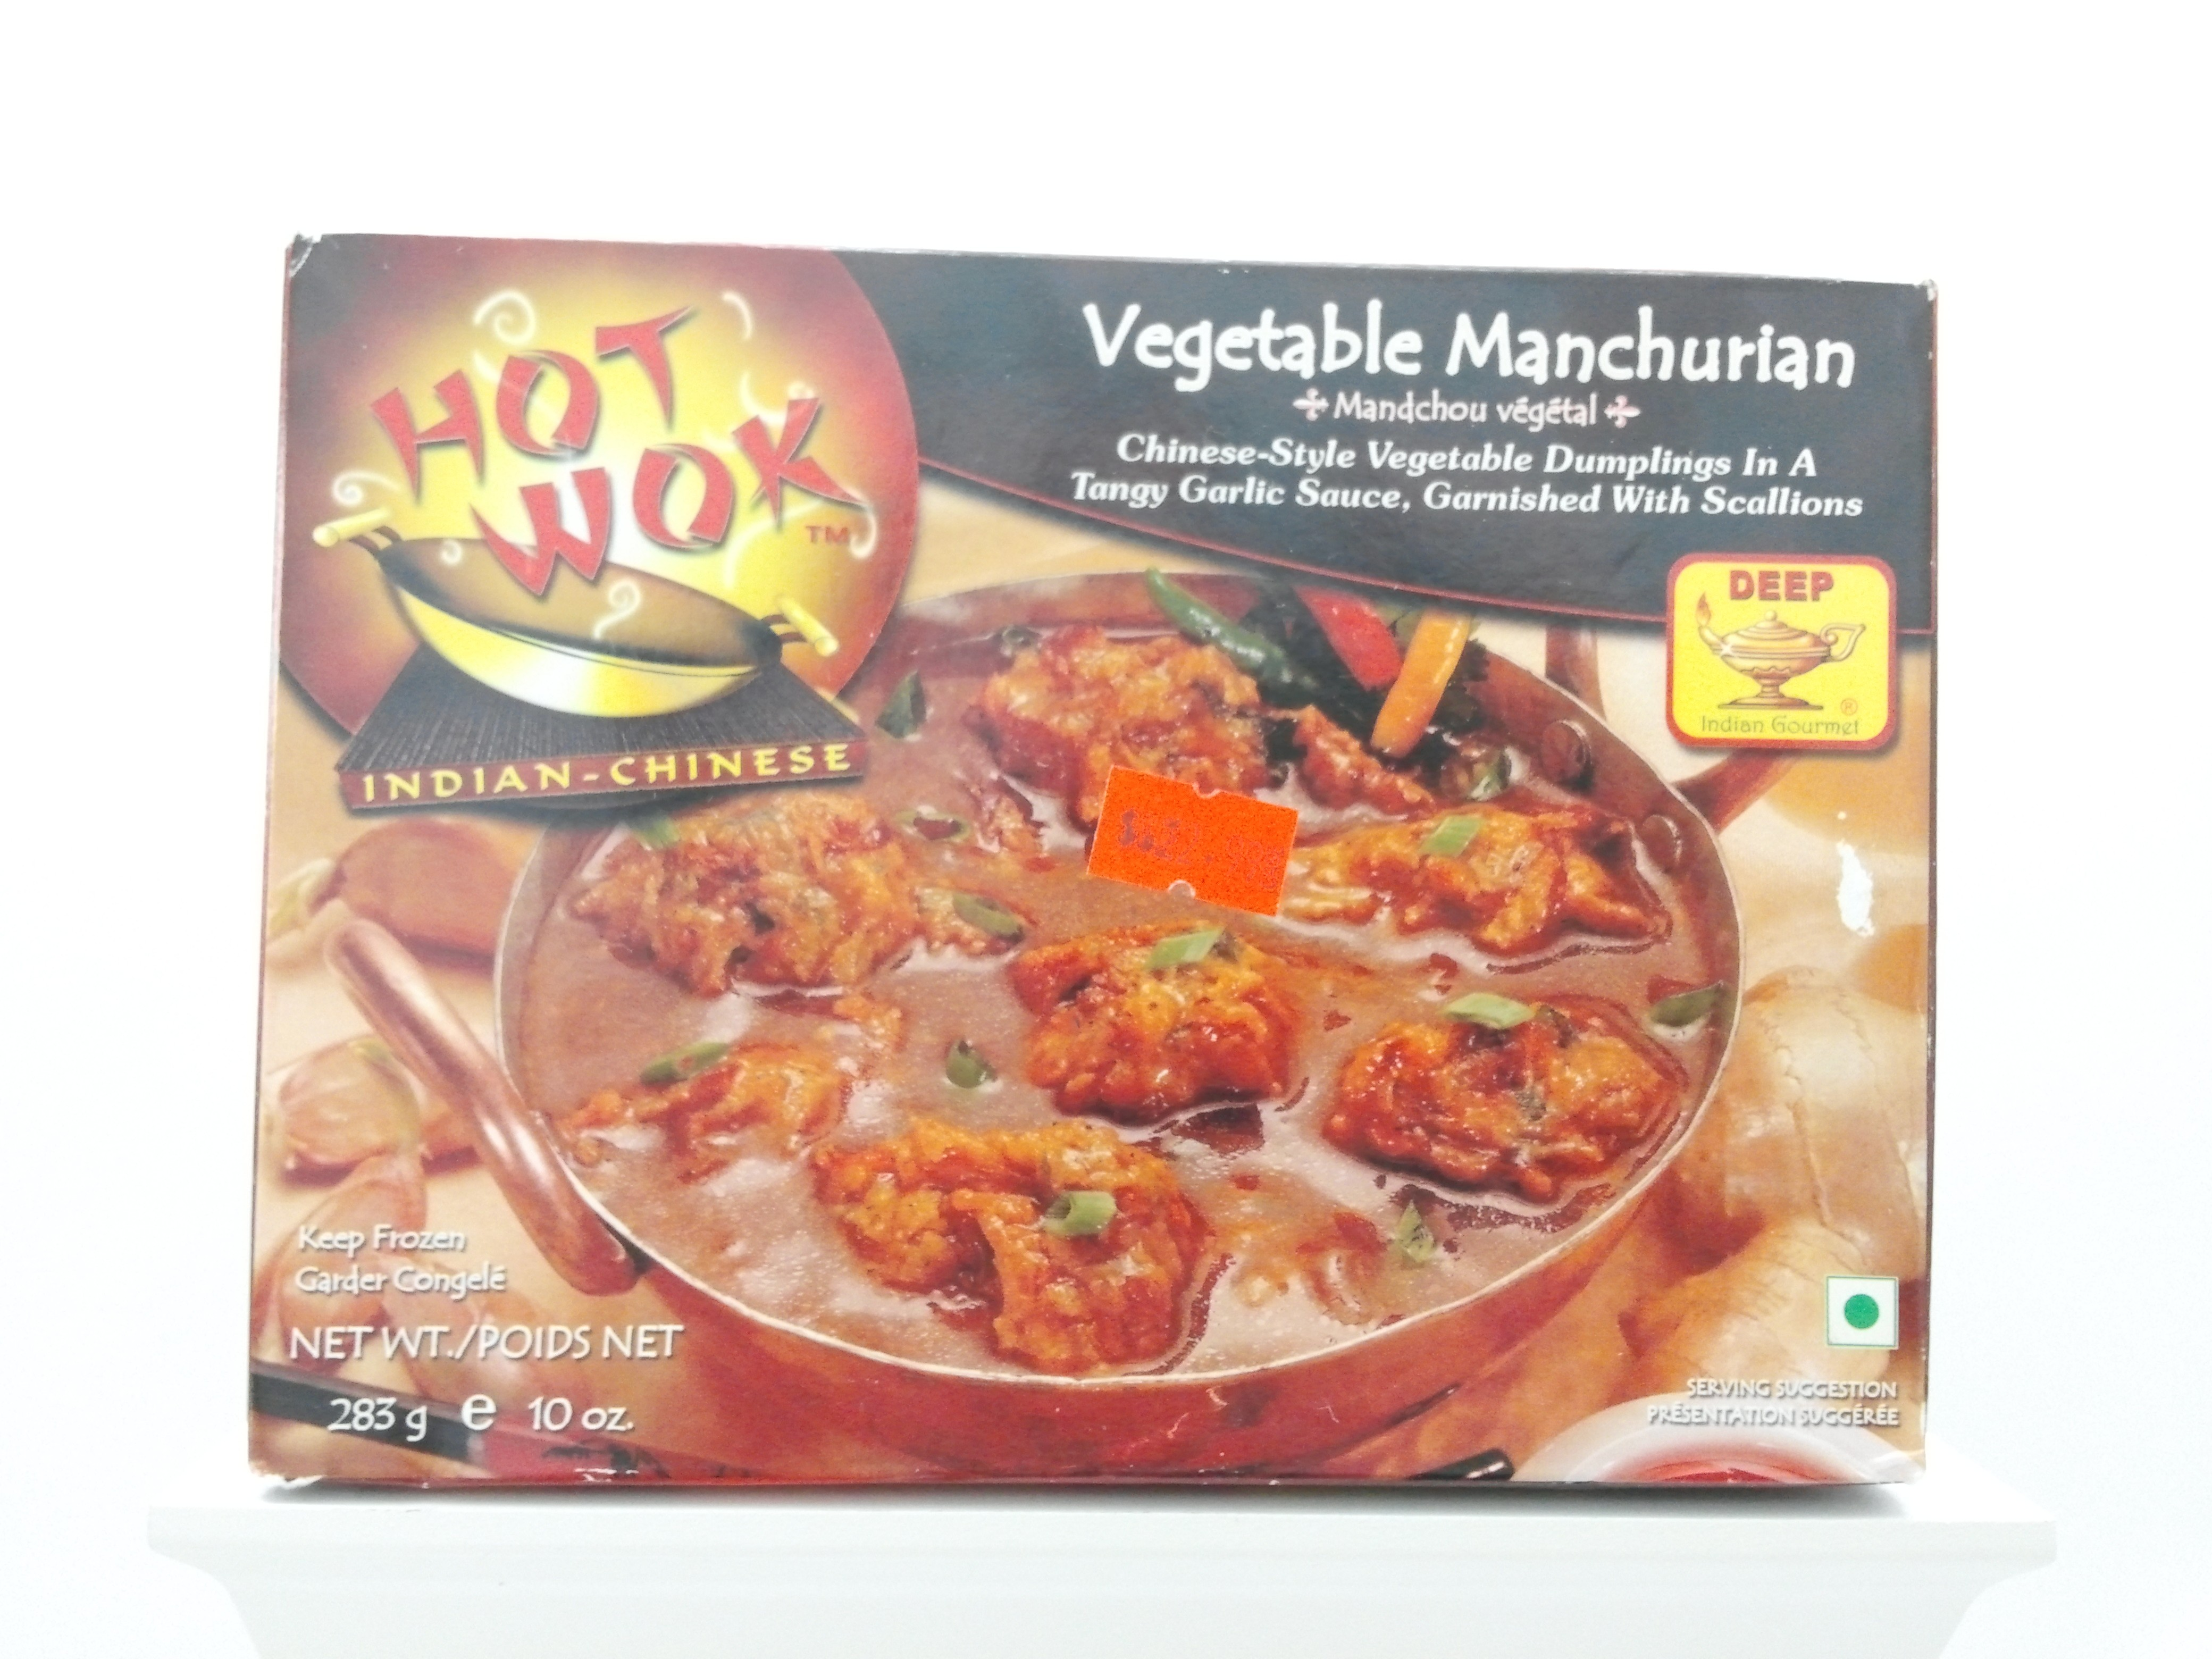 Hot Wok Vegetable Manchurian 10 oz